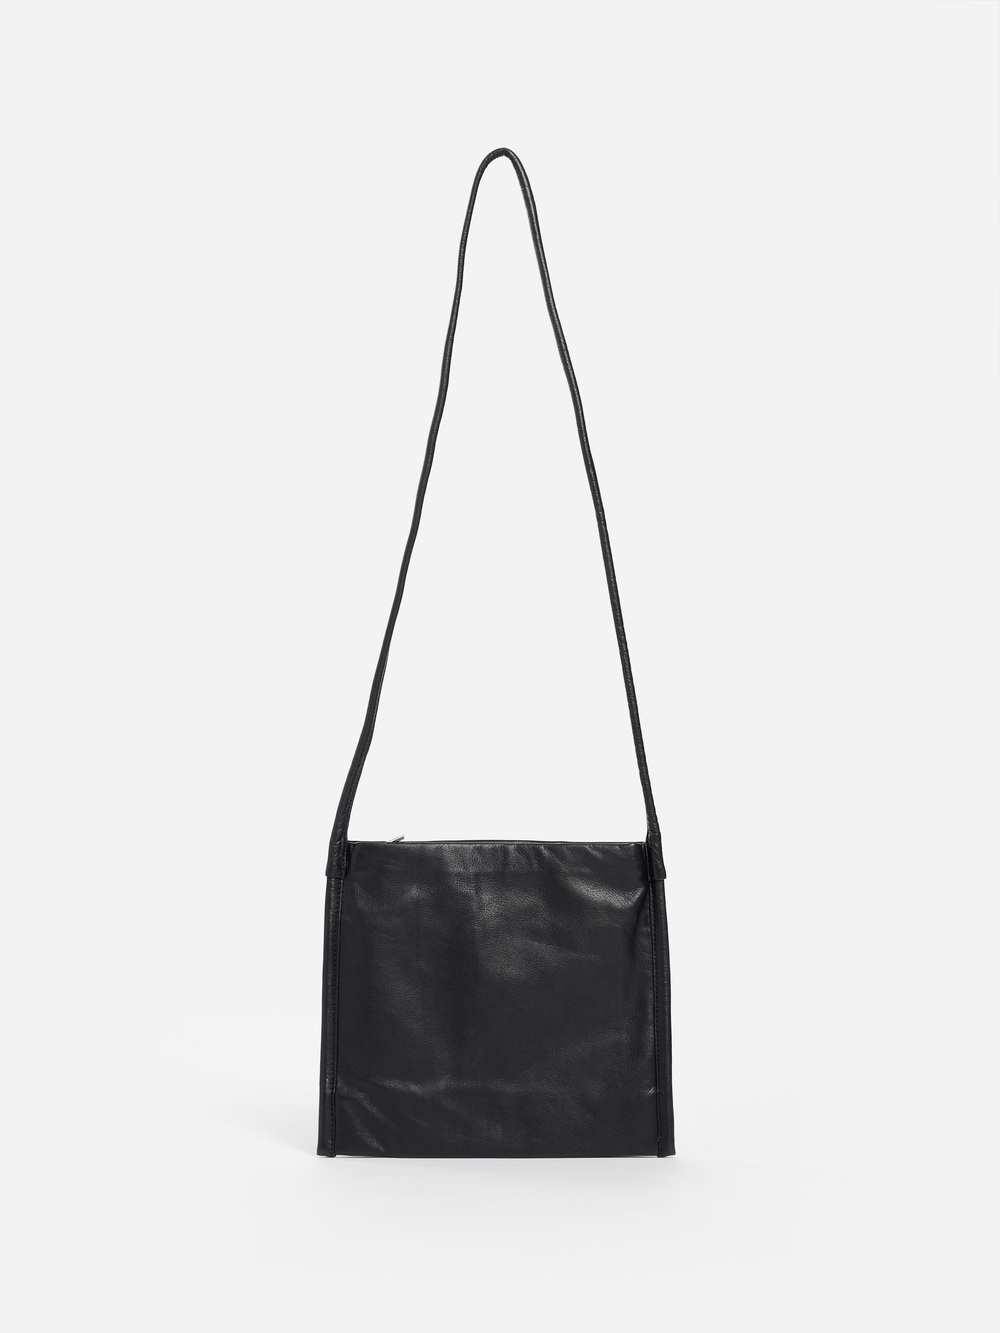 2916ecabd9 Yohji Yamamoto Women s Black Sacoche Shoulder Bag